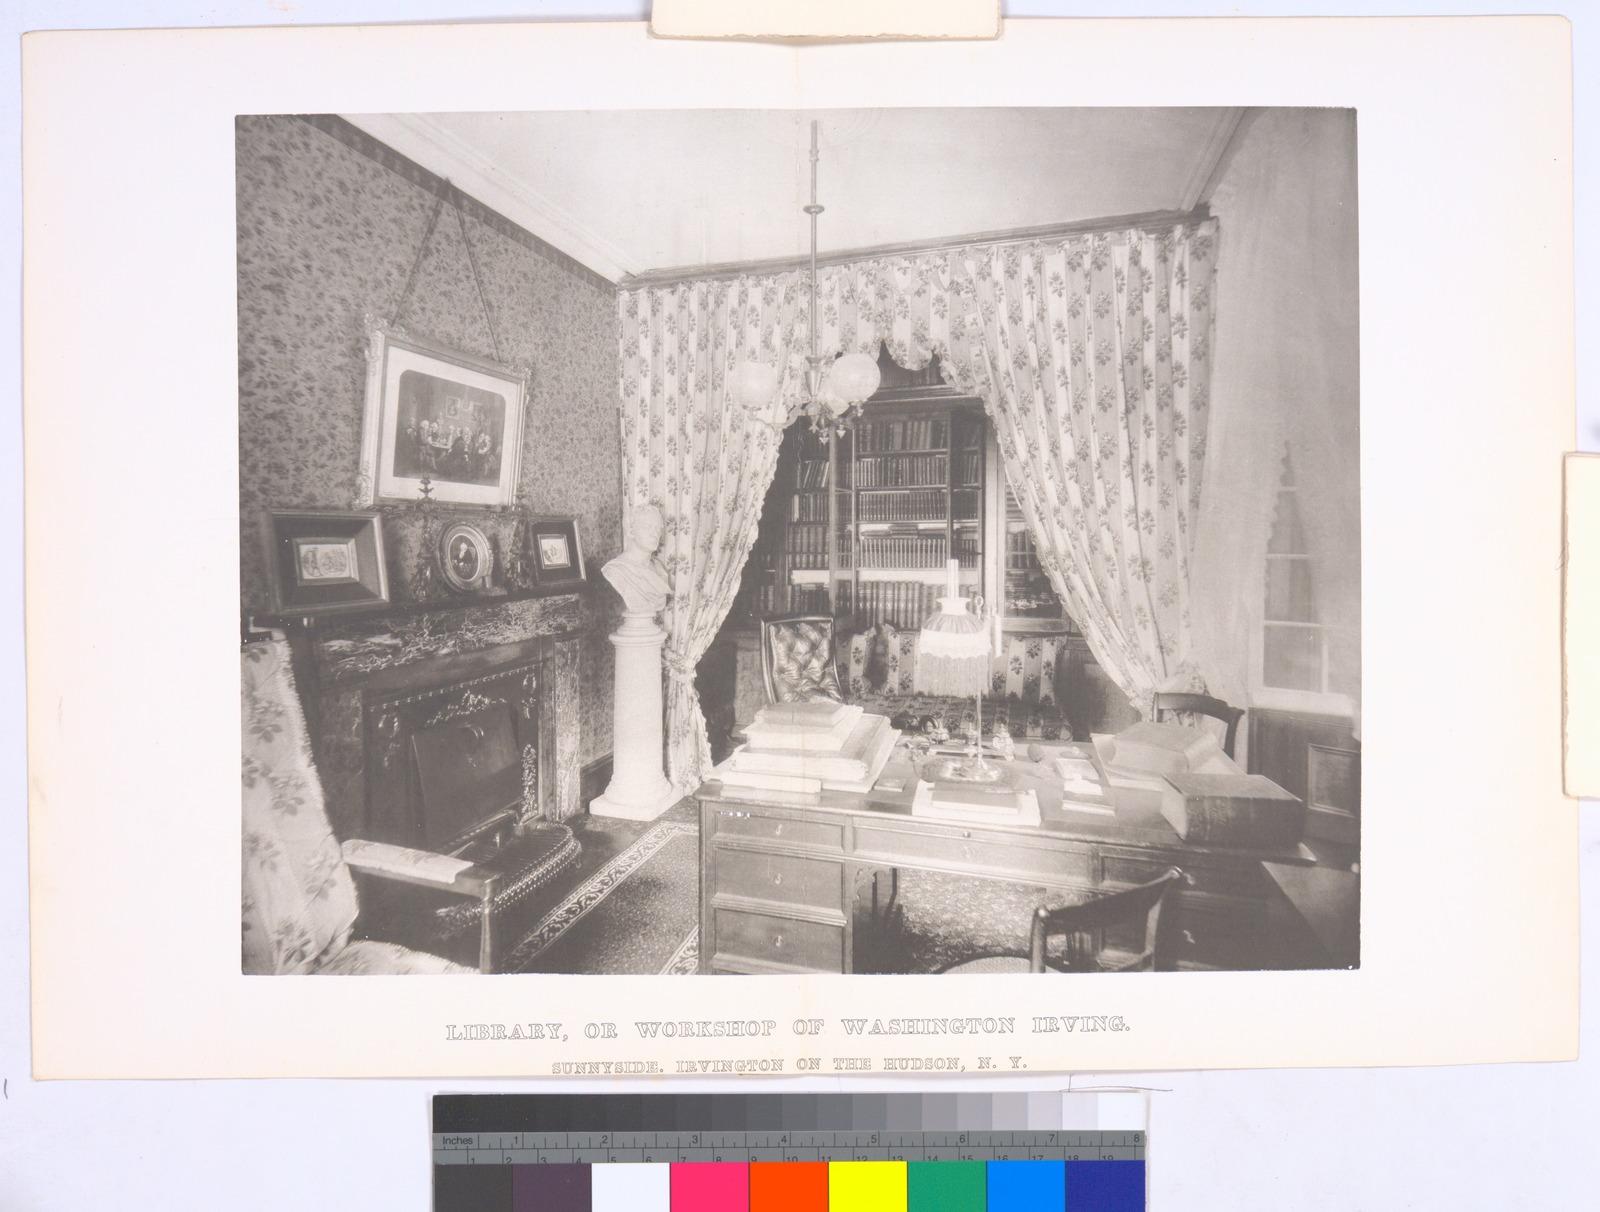 Library, or workshop of Washington Irving. Sunnyside, Irvingston on the Hudson, N.Y.